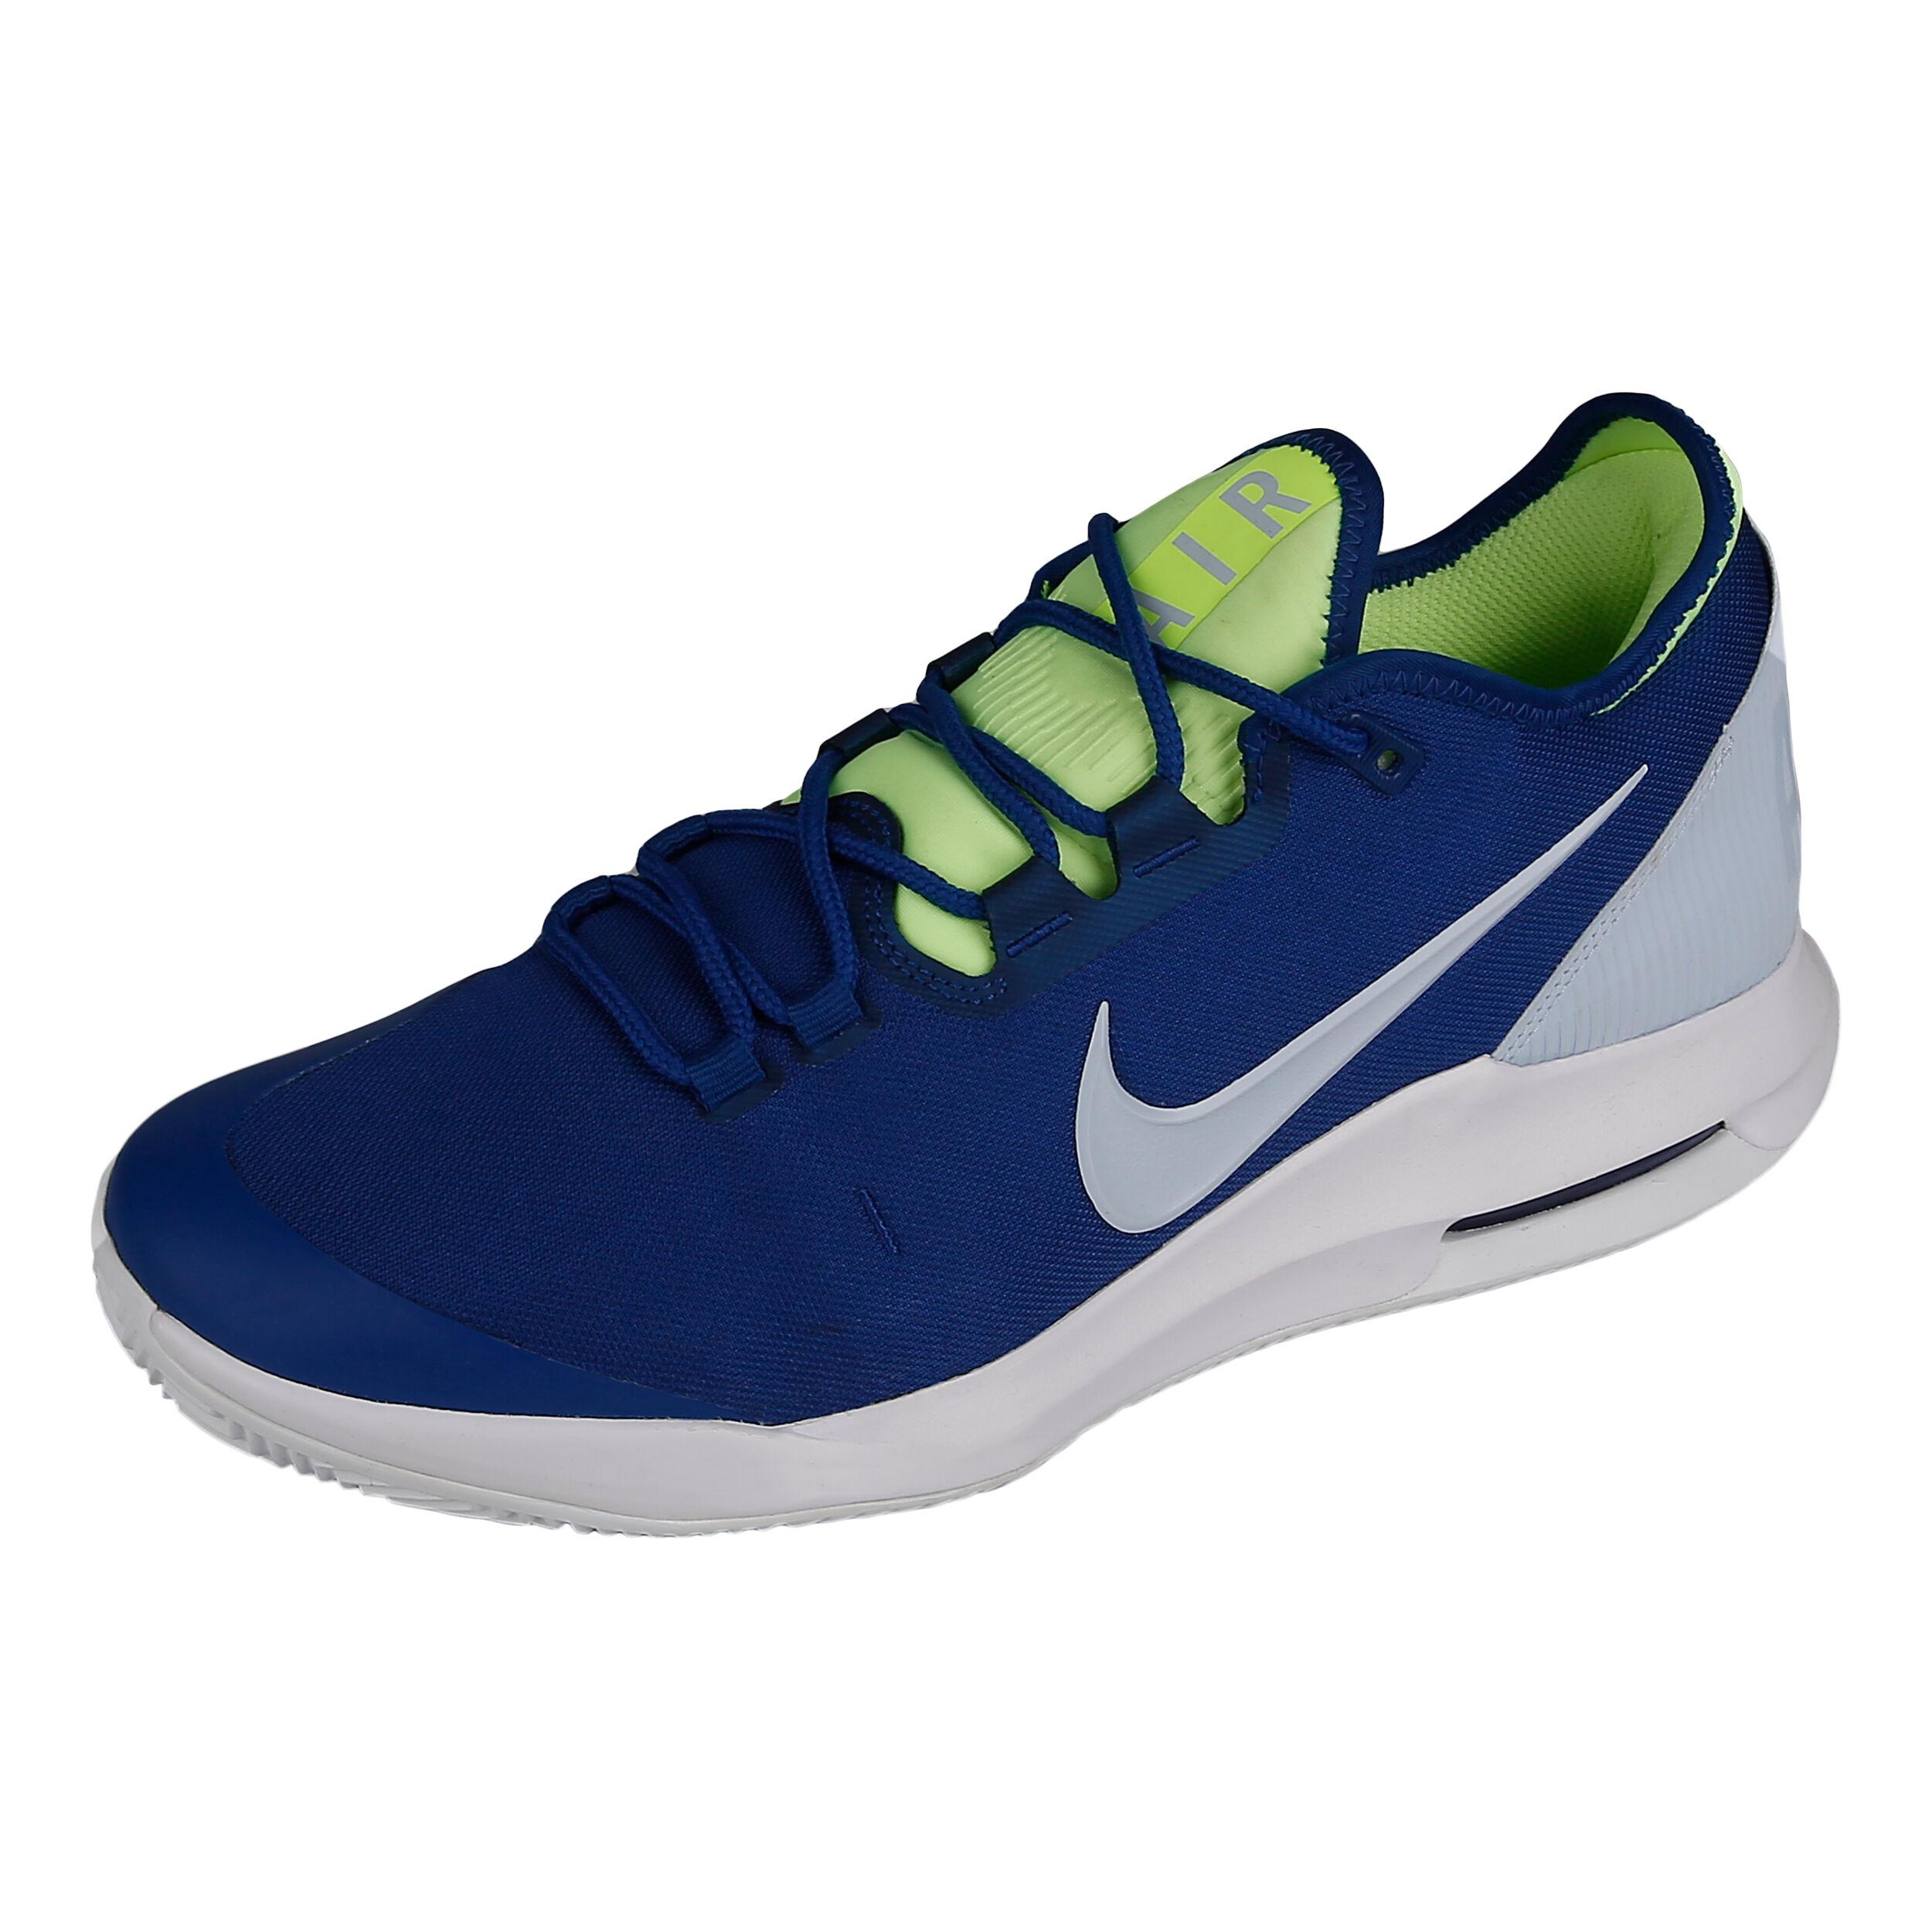 Chaussures Nike Court Air Max Wildcard Terre Battue